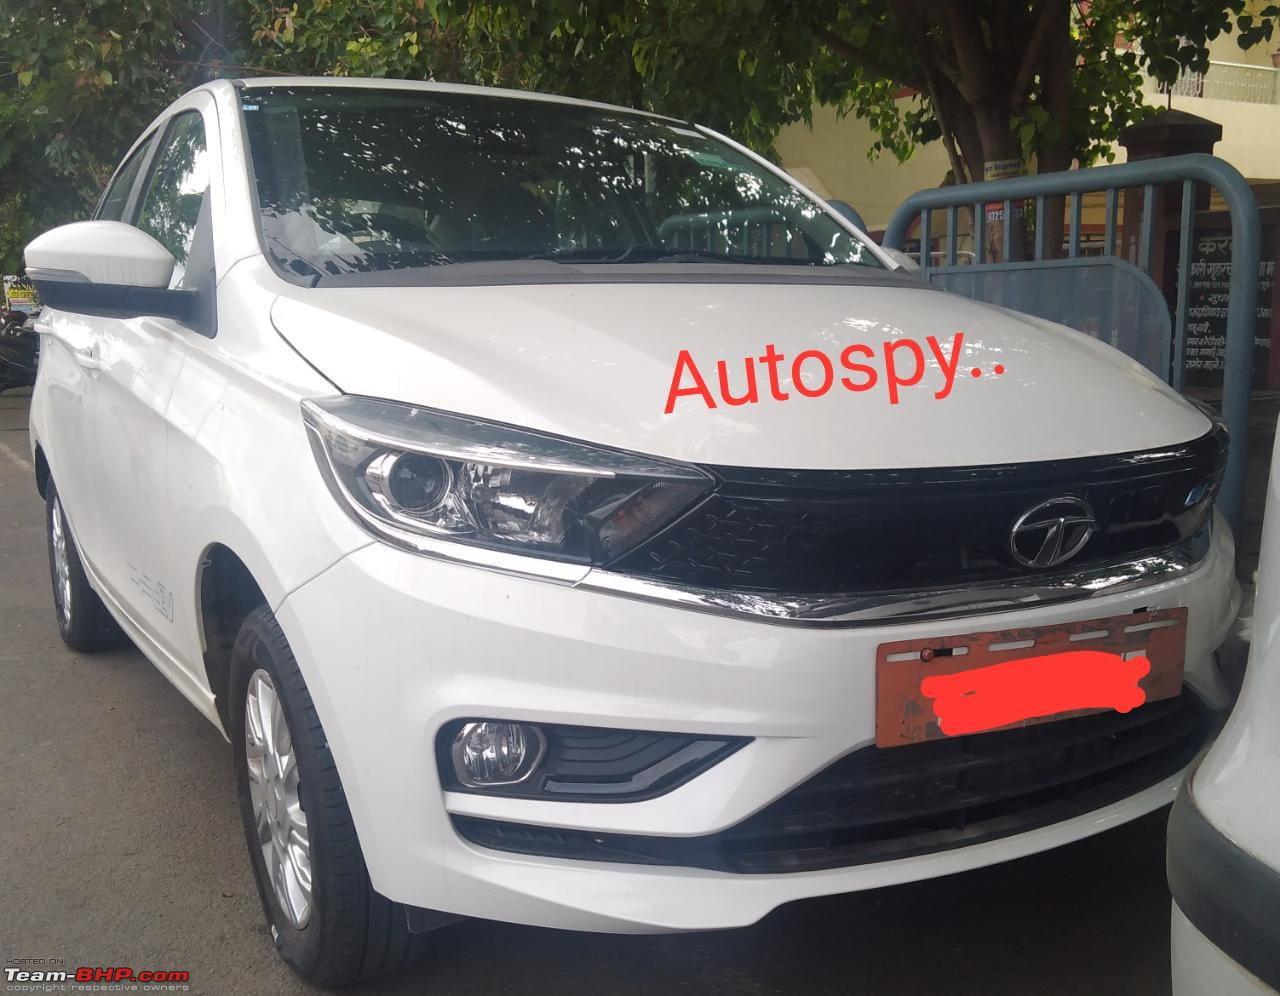 Tata Tigor EV front view Autospy